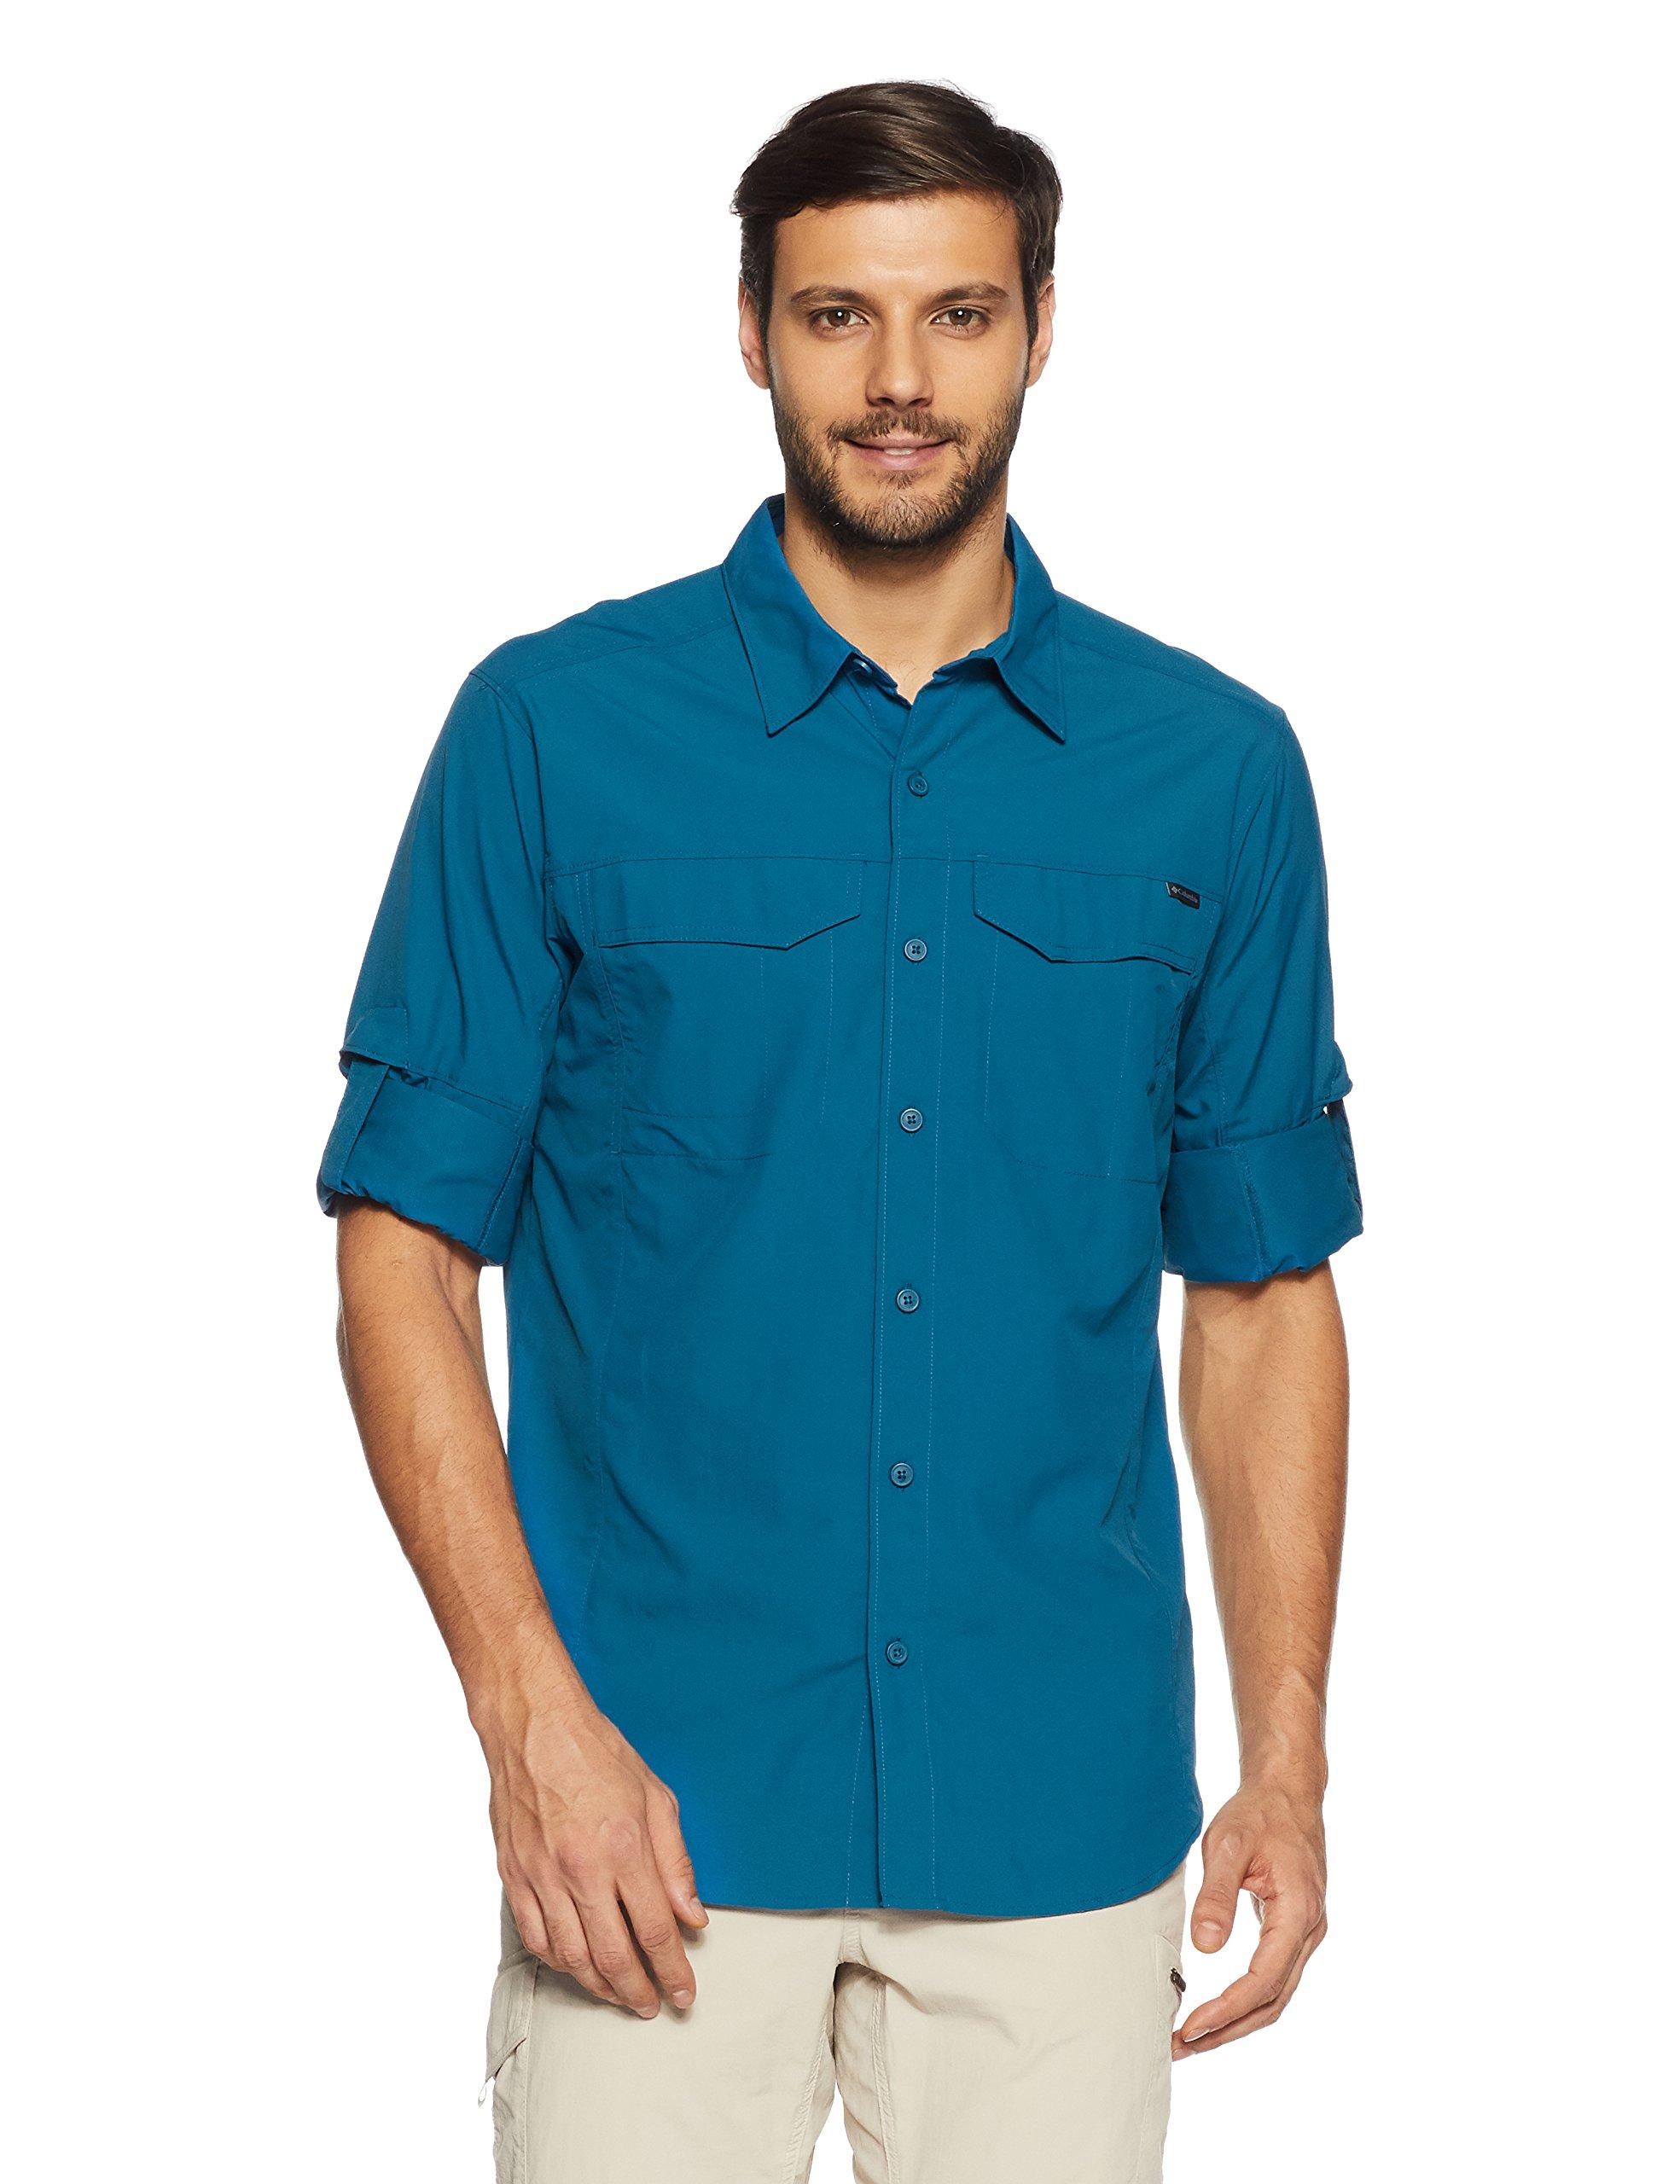 Columbia Camisa de Manga Corta para Hombre Modelo Silver Ridge, Hombre, AM7453, Phoenix Blue, XX-Large: Amazon.es: Deportes y aire libre